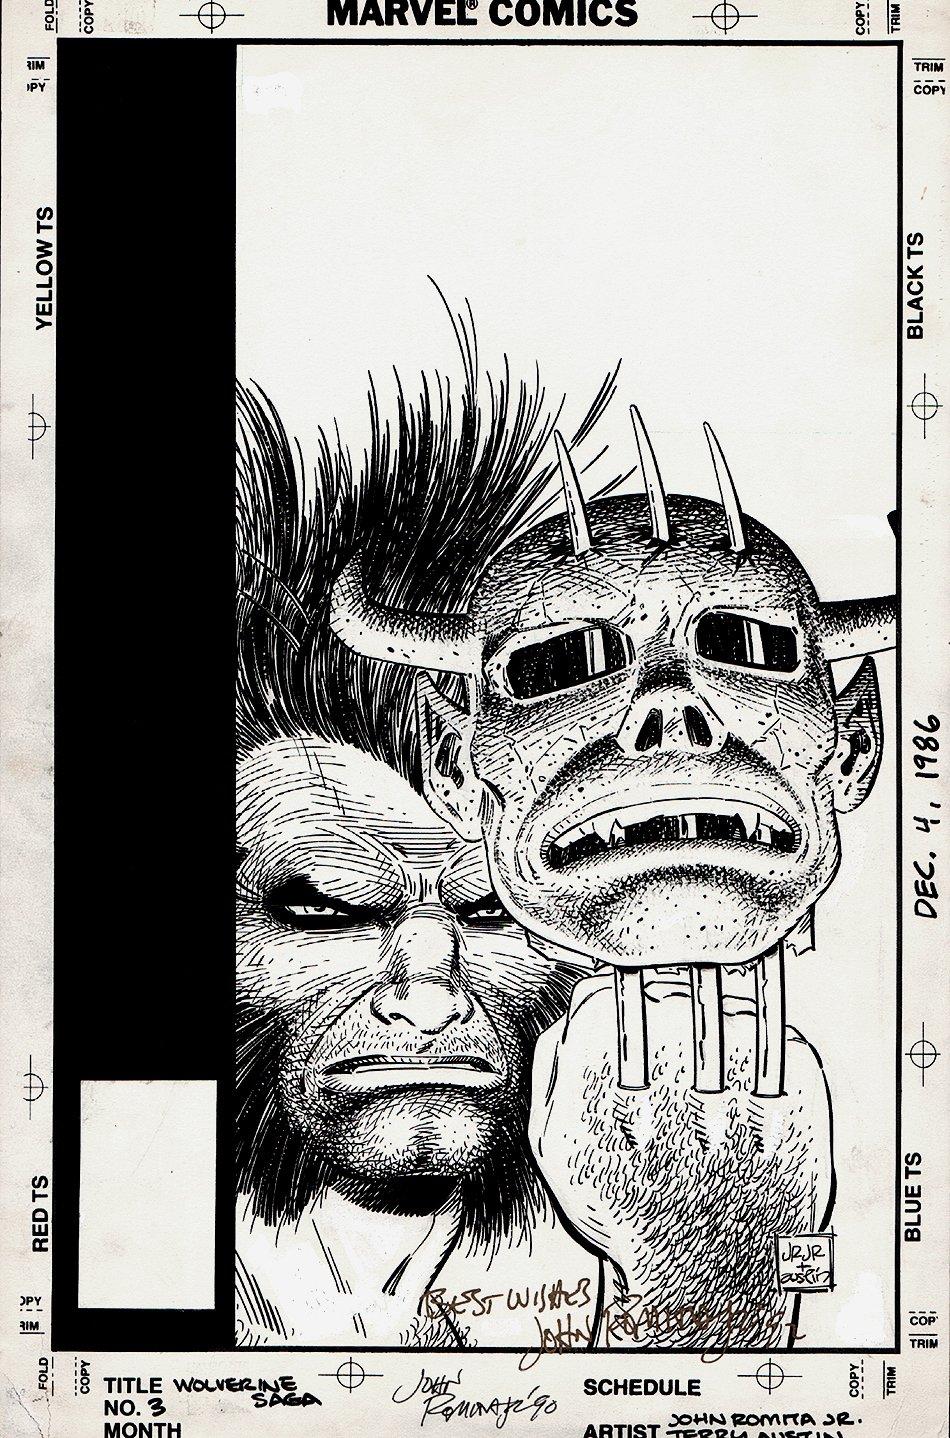 Wolverine Saga #3 Cover (1989)